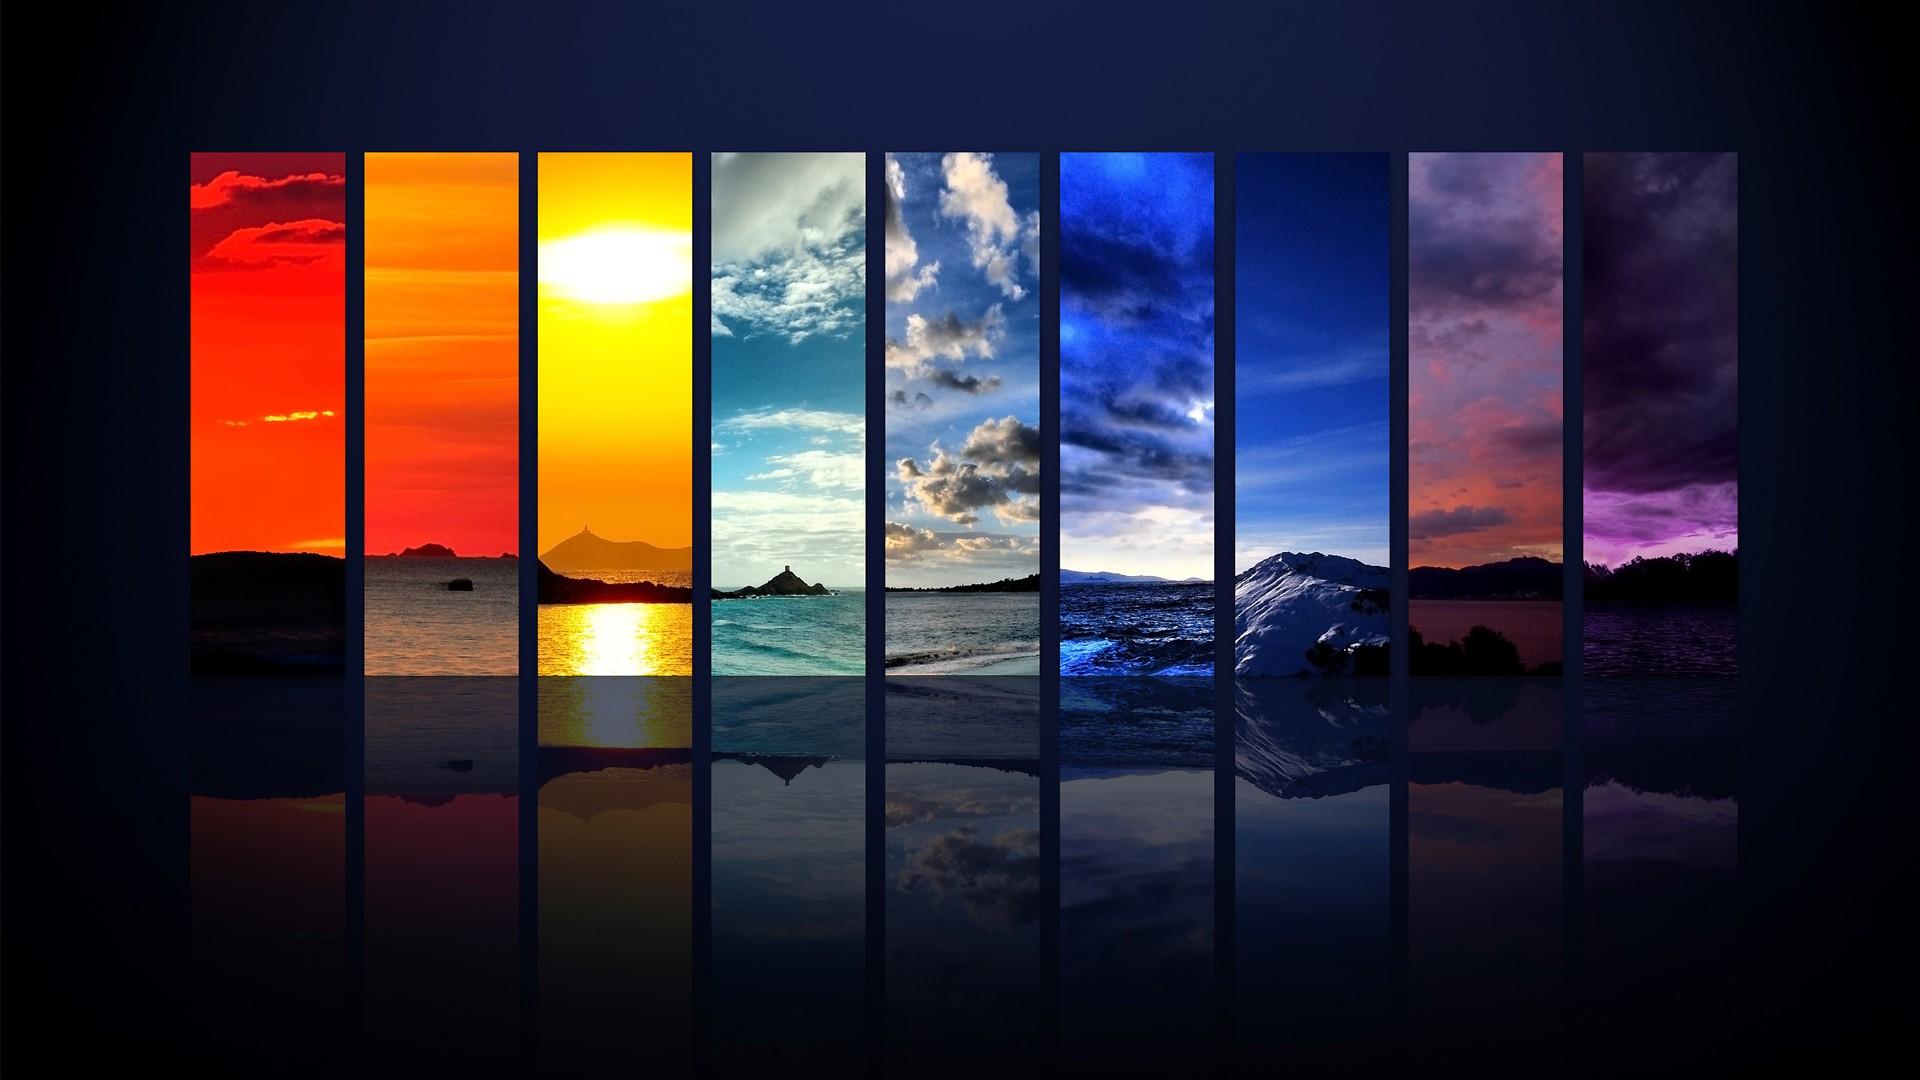 Cool Desktop Backgrounds HD Wallpaper1 wallpapers55com   Best 1920x1080